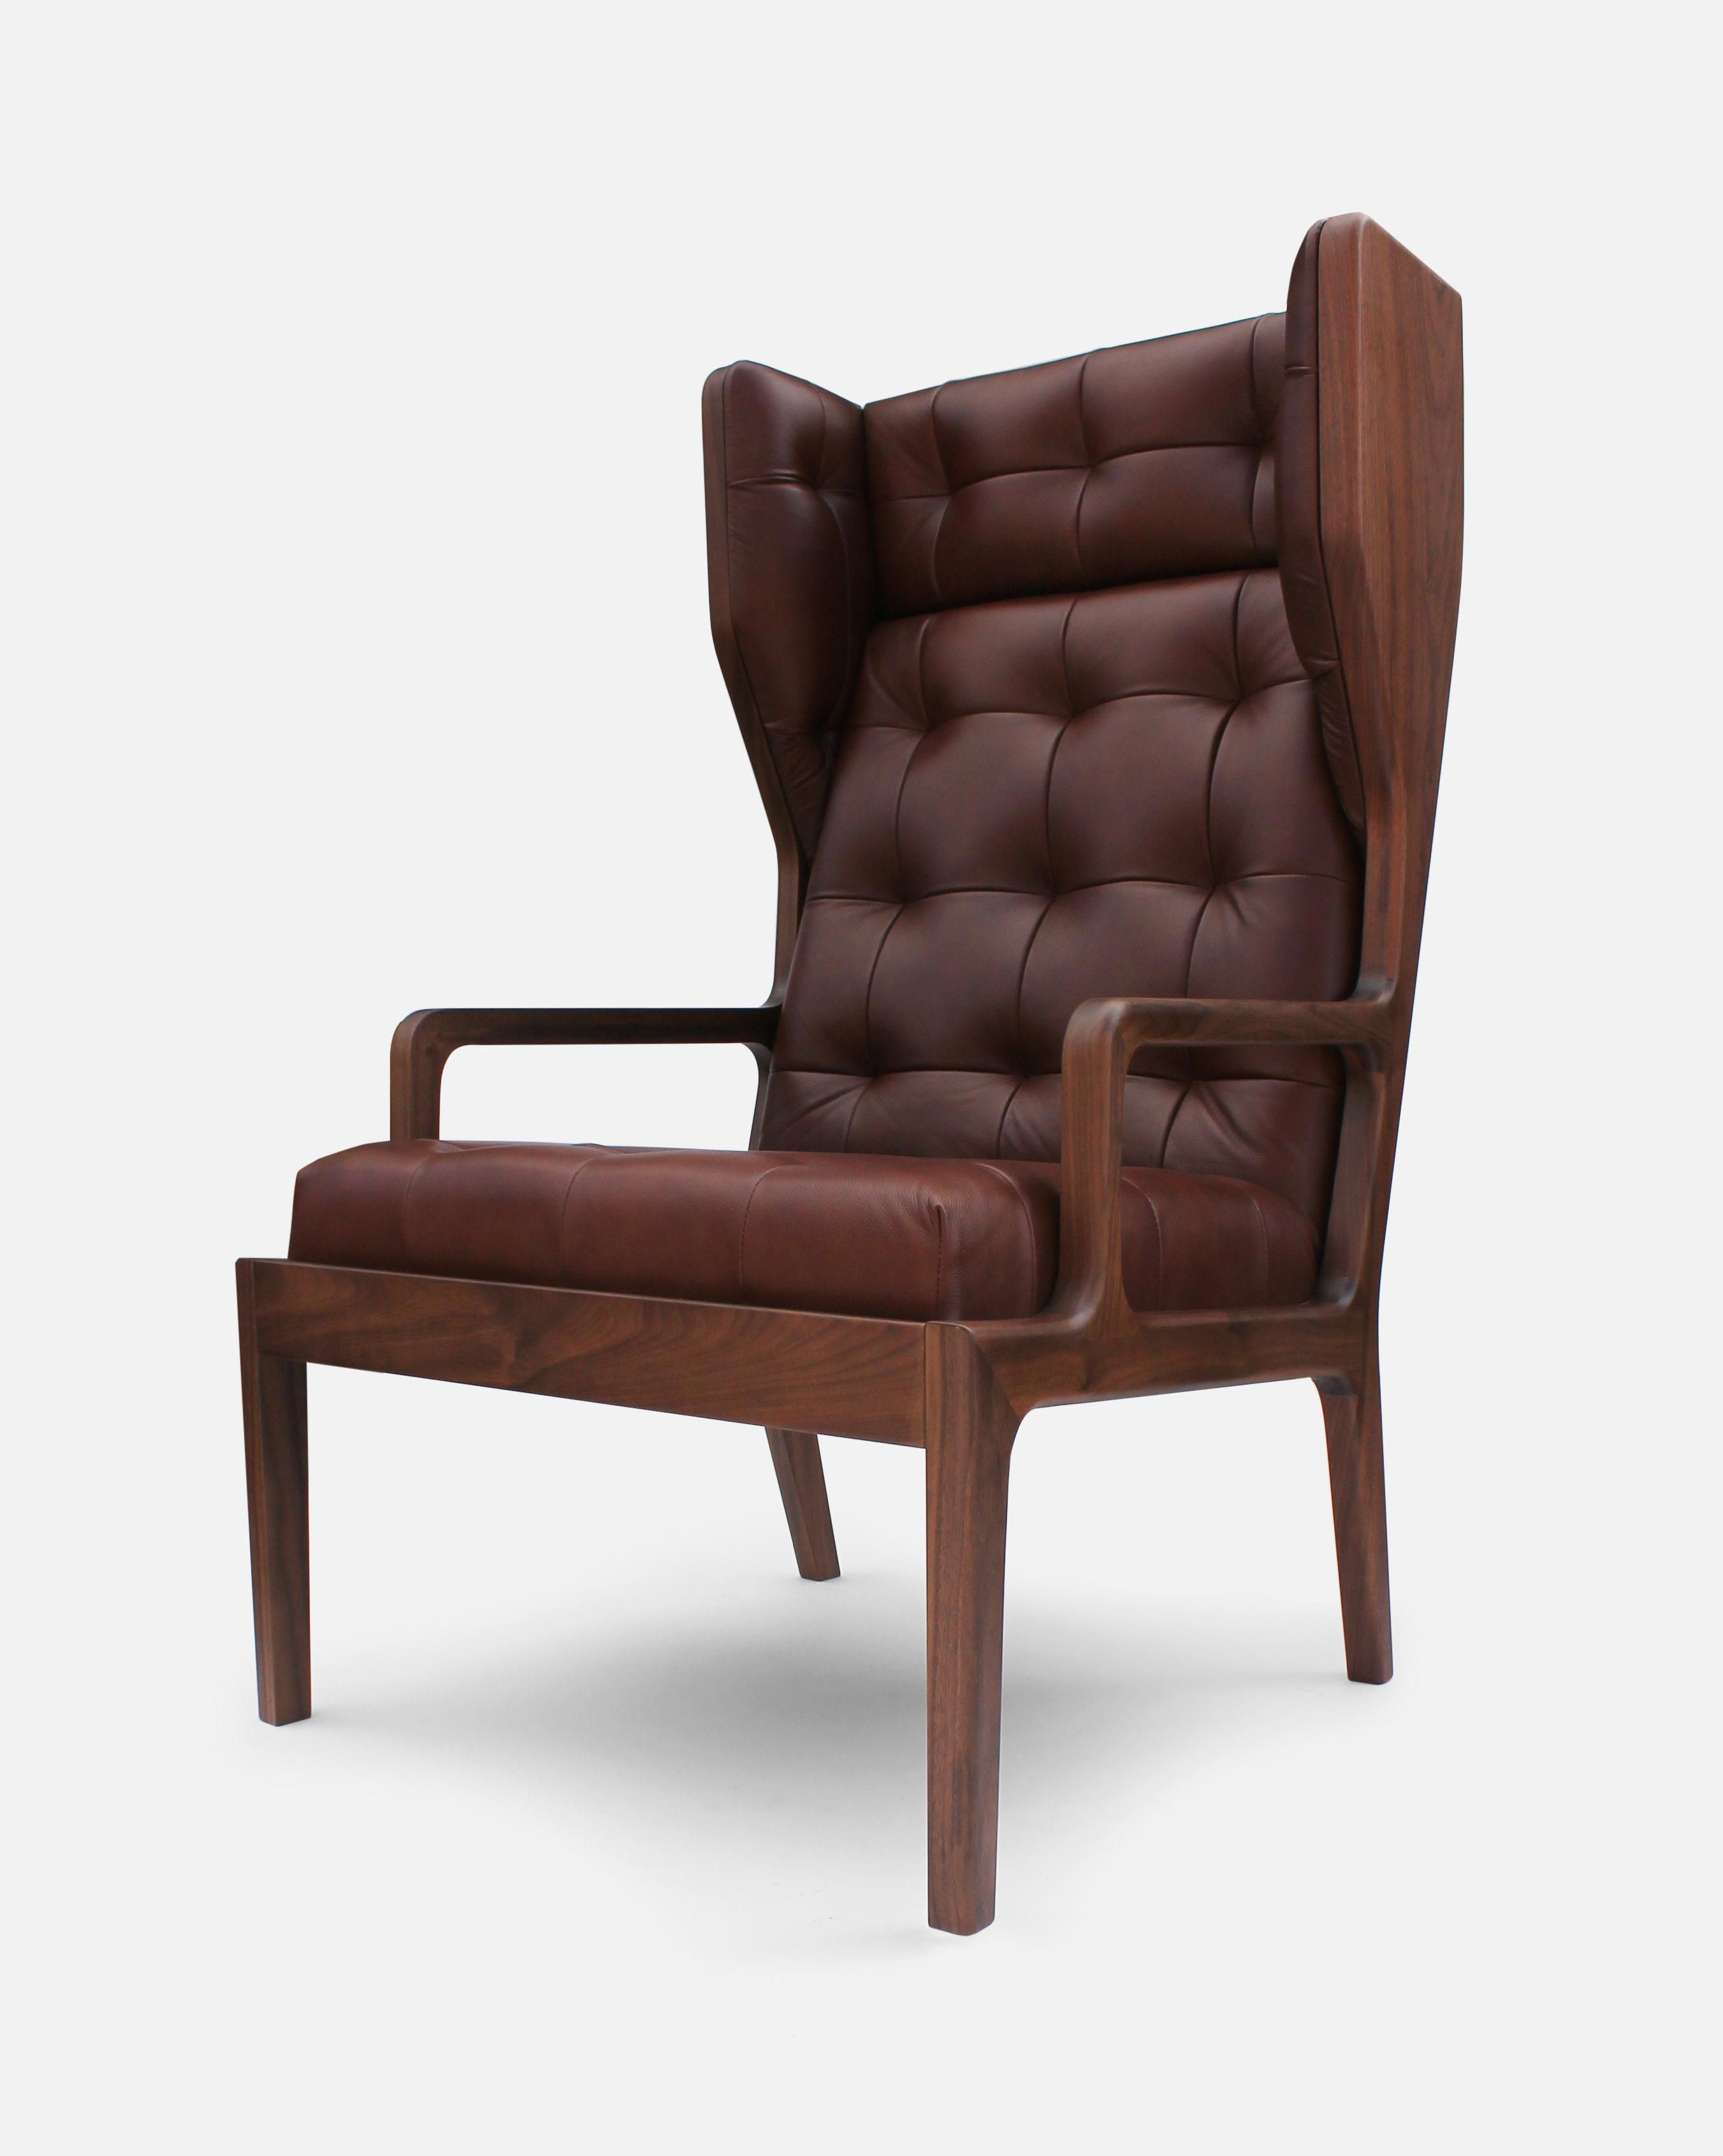 Admirable Small Swivel Chairs For Living Room Wingbackchair Creativecarmelina Interior Chair Design Creativecarmelinacom